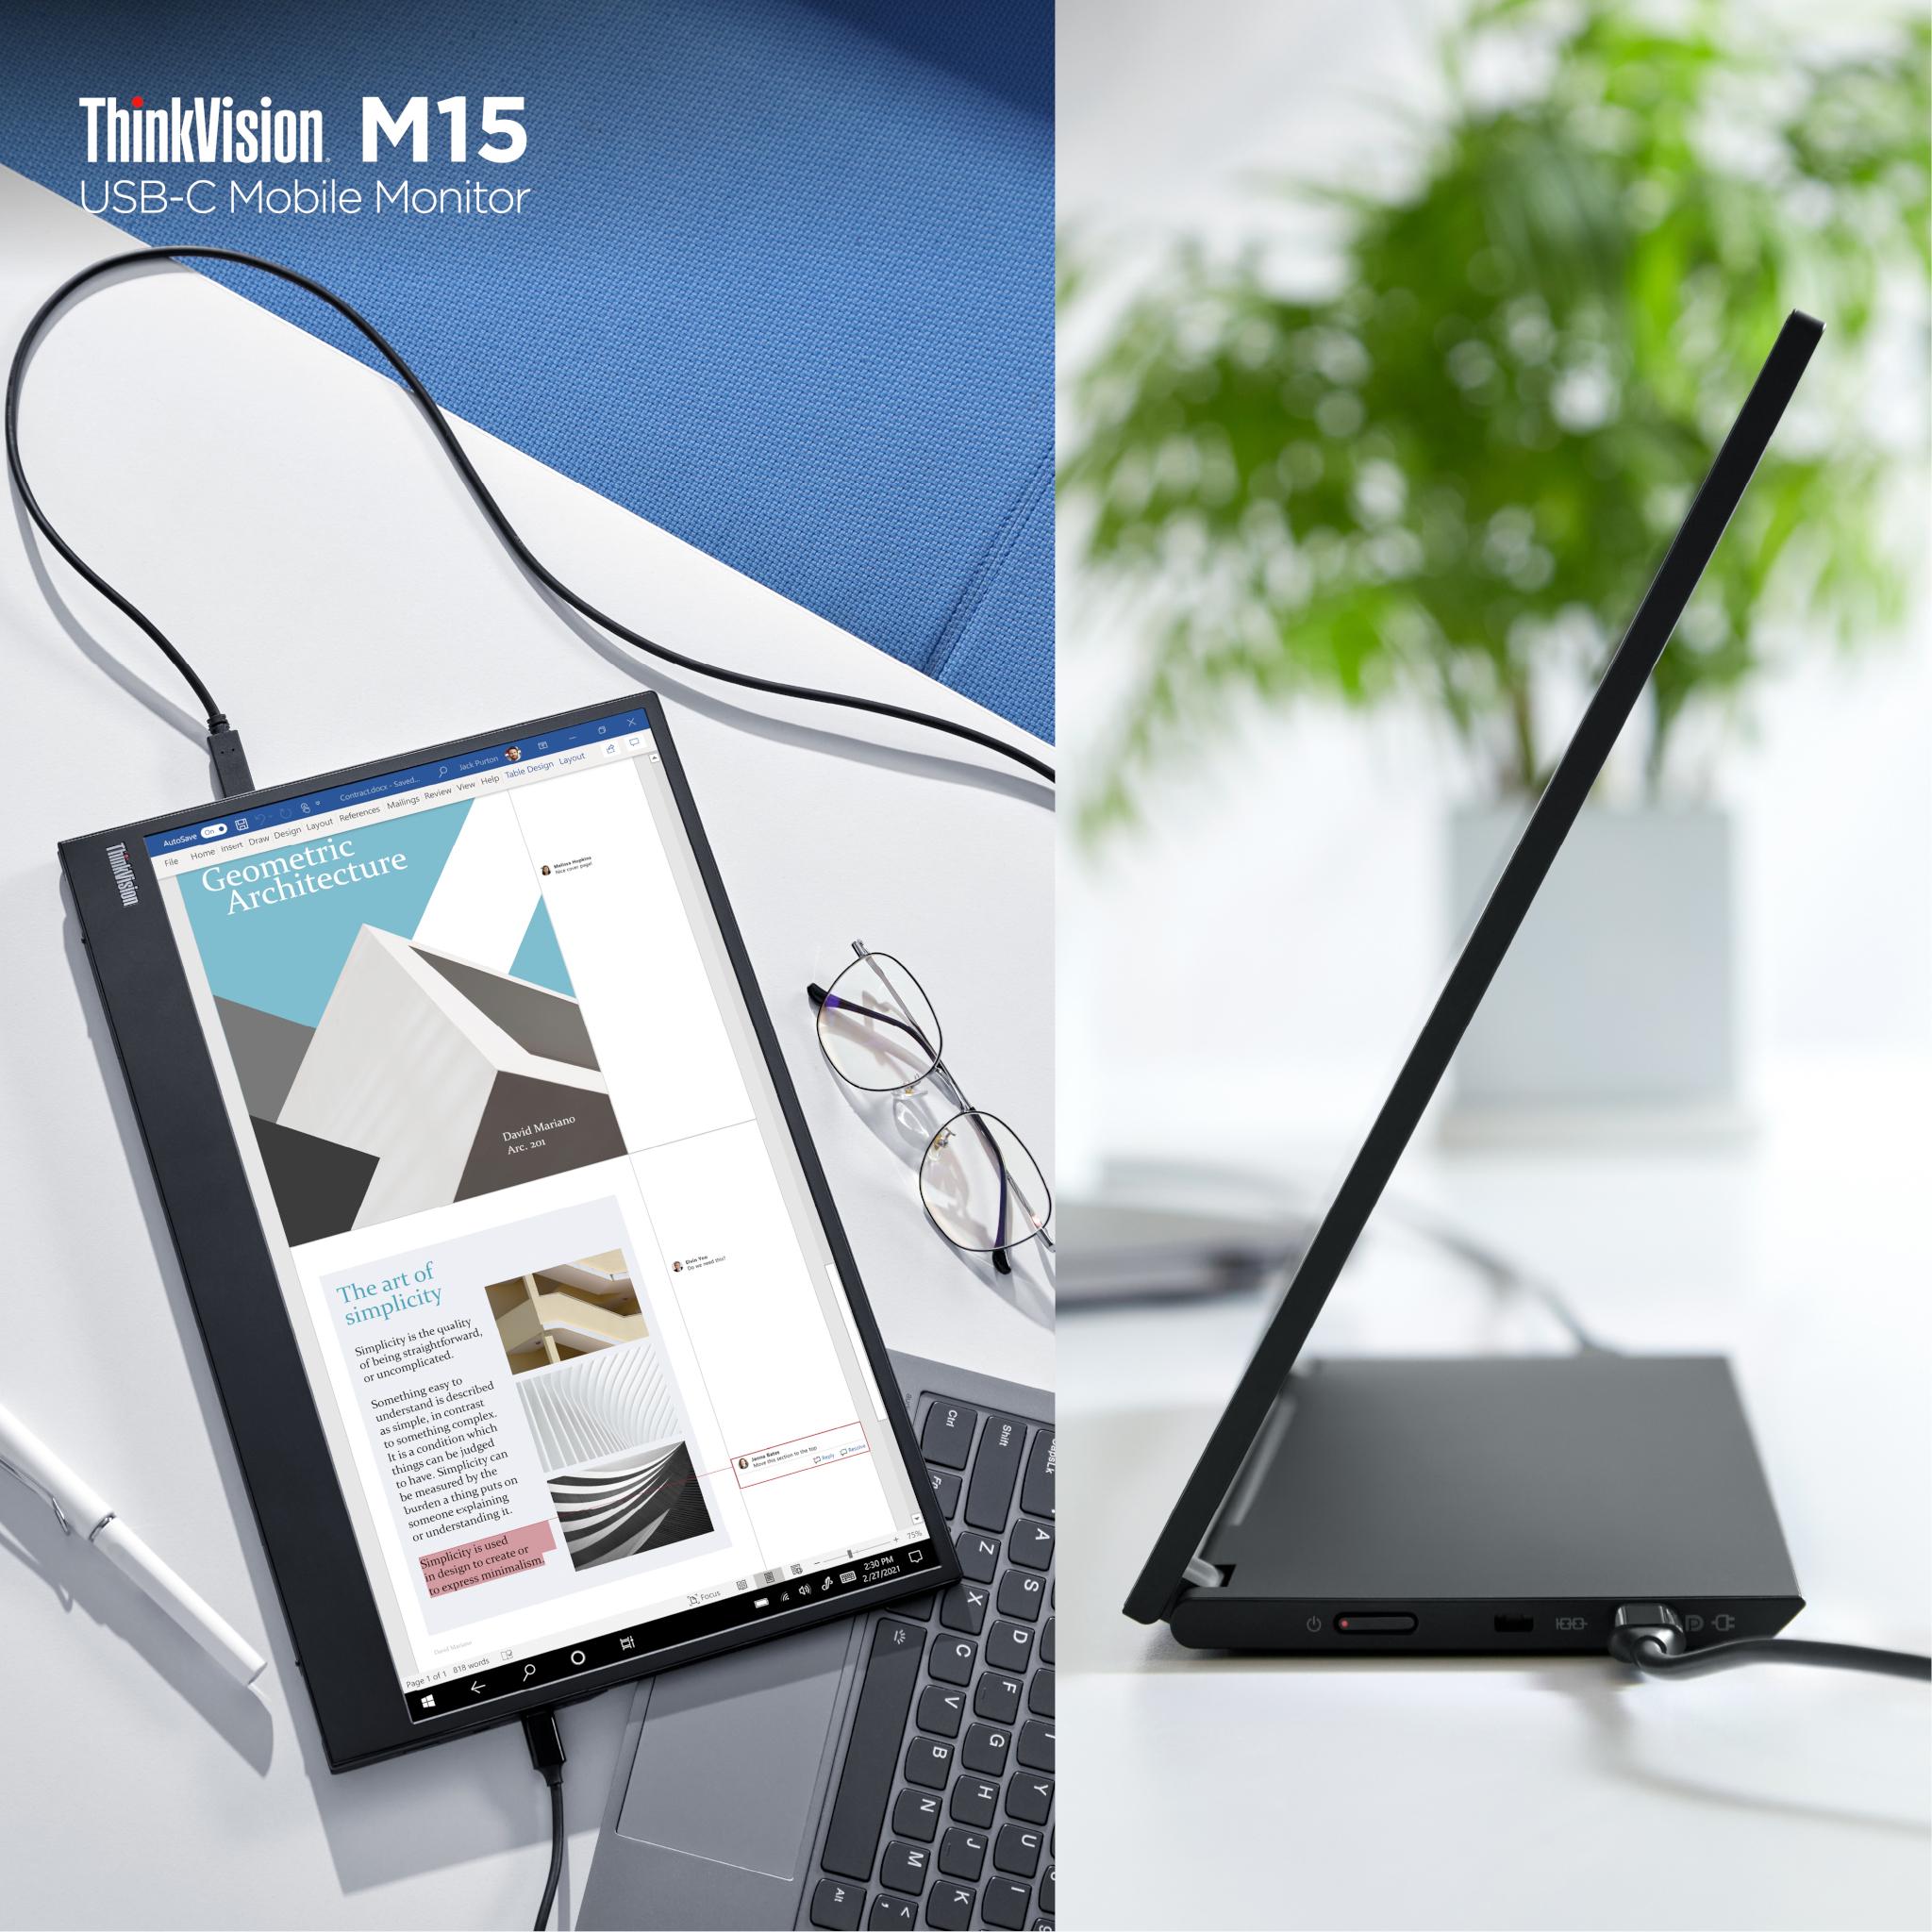 USB-C Mobile Monitors